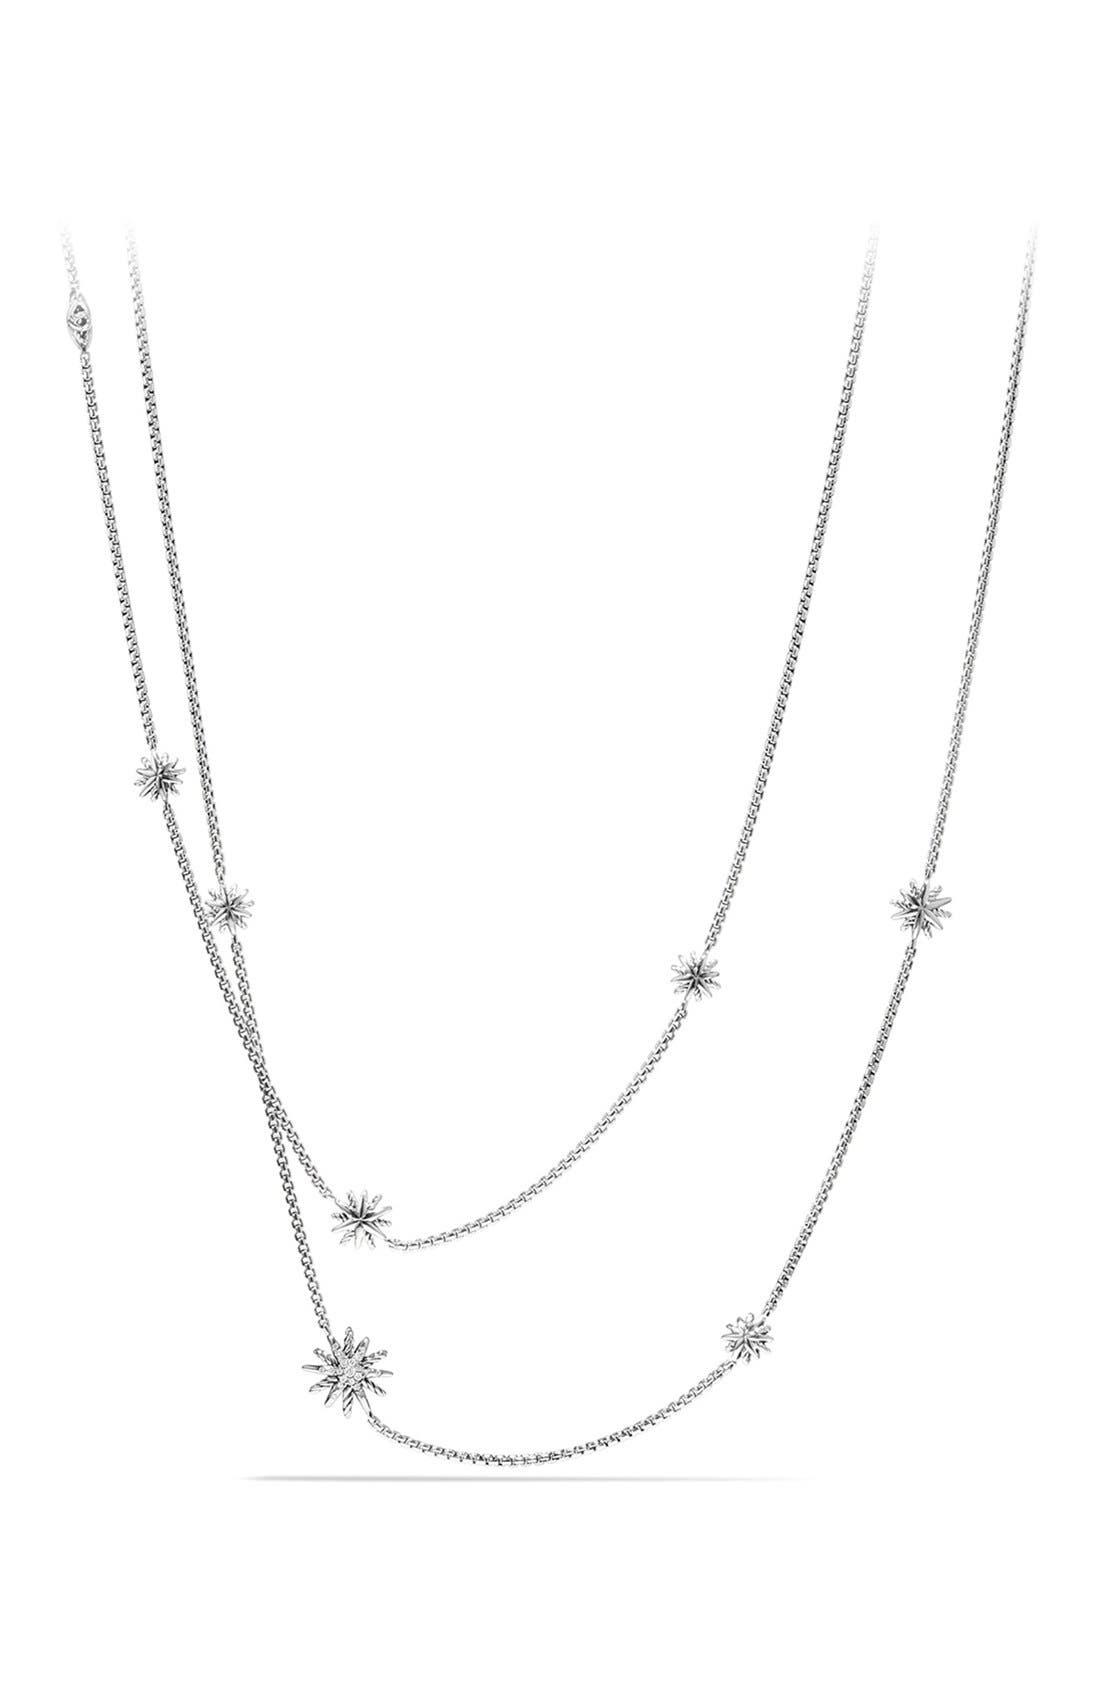 'Starburst' Station Necklace with Diamonds,                             Main thumbnail 1, color,                             DIAMOND